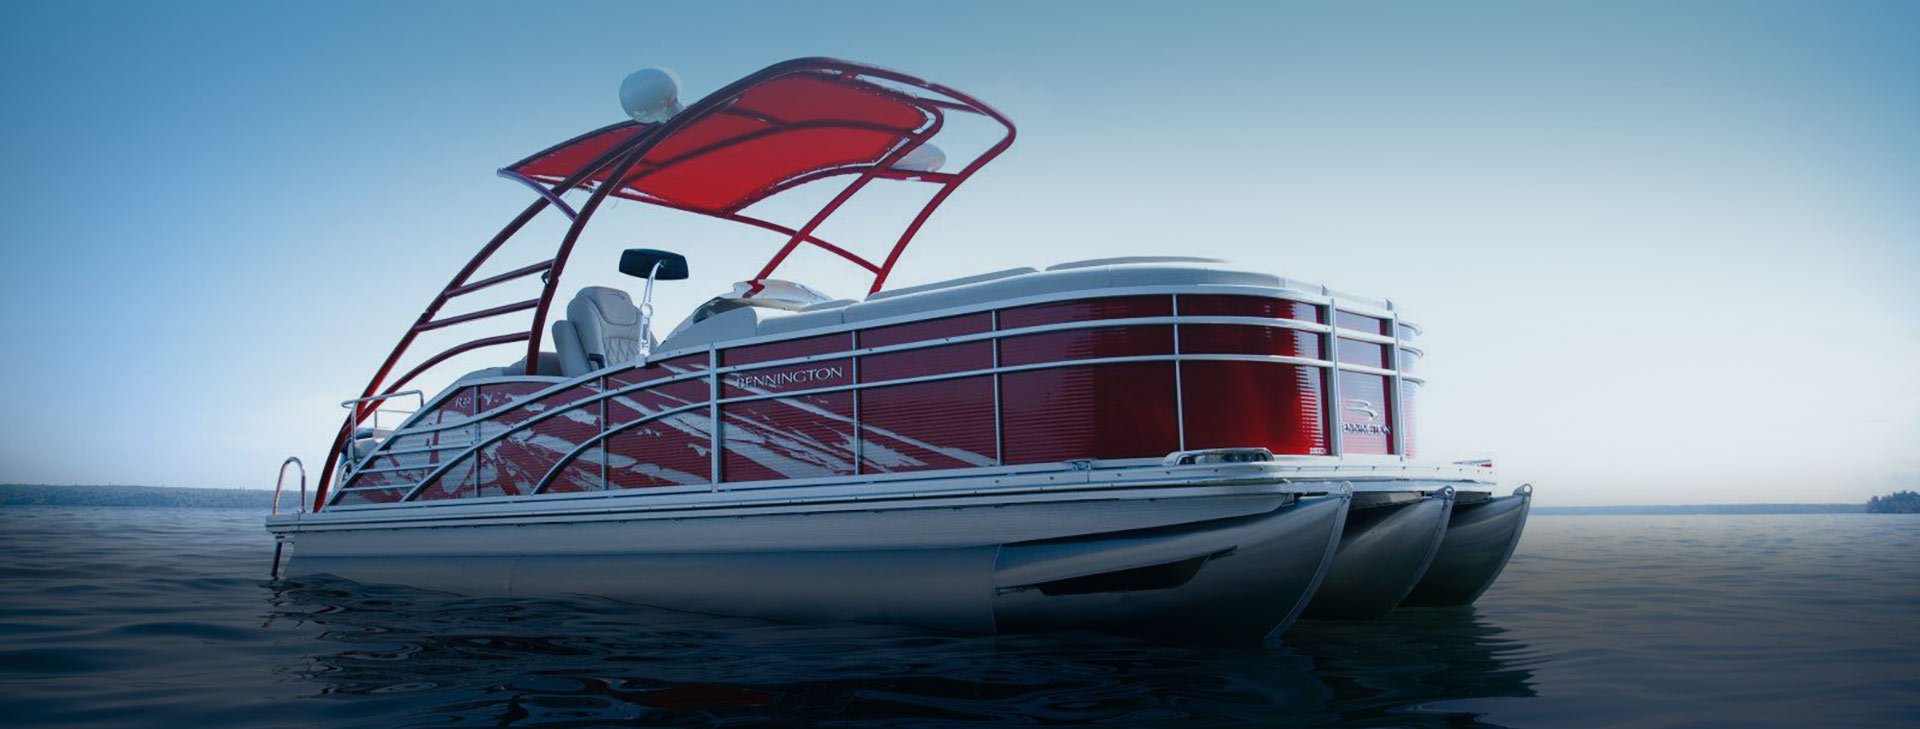 Kooper's Marine, LLC | New and Used Pontoon Boats for Sale